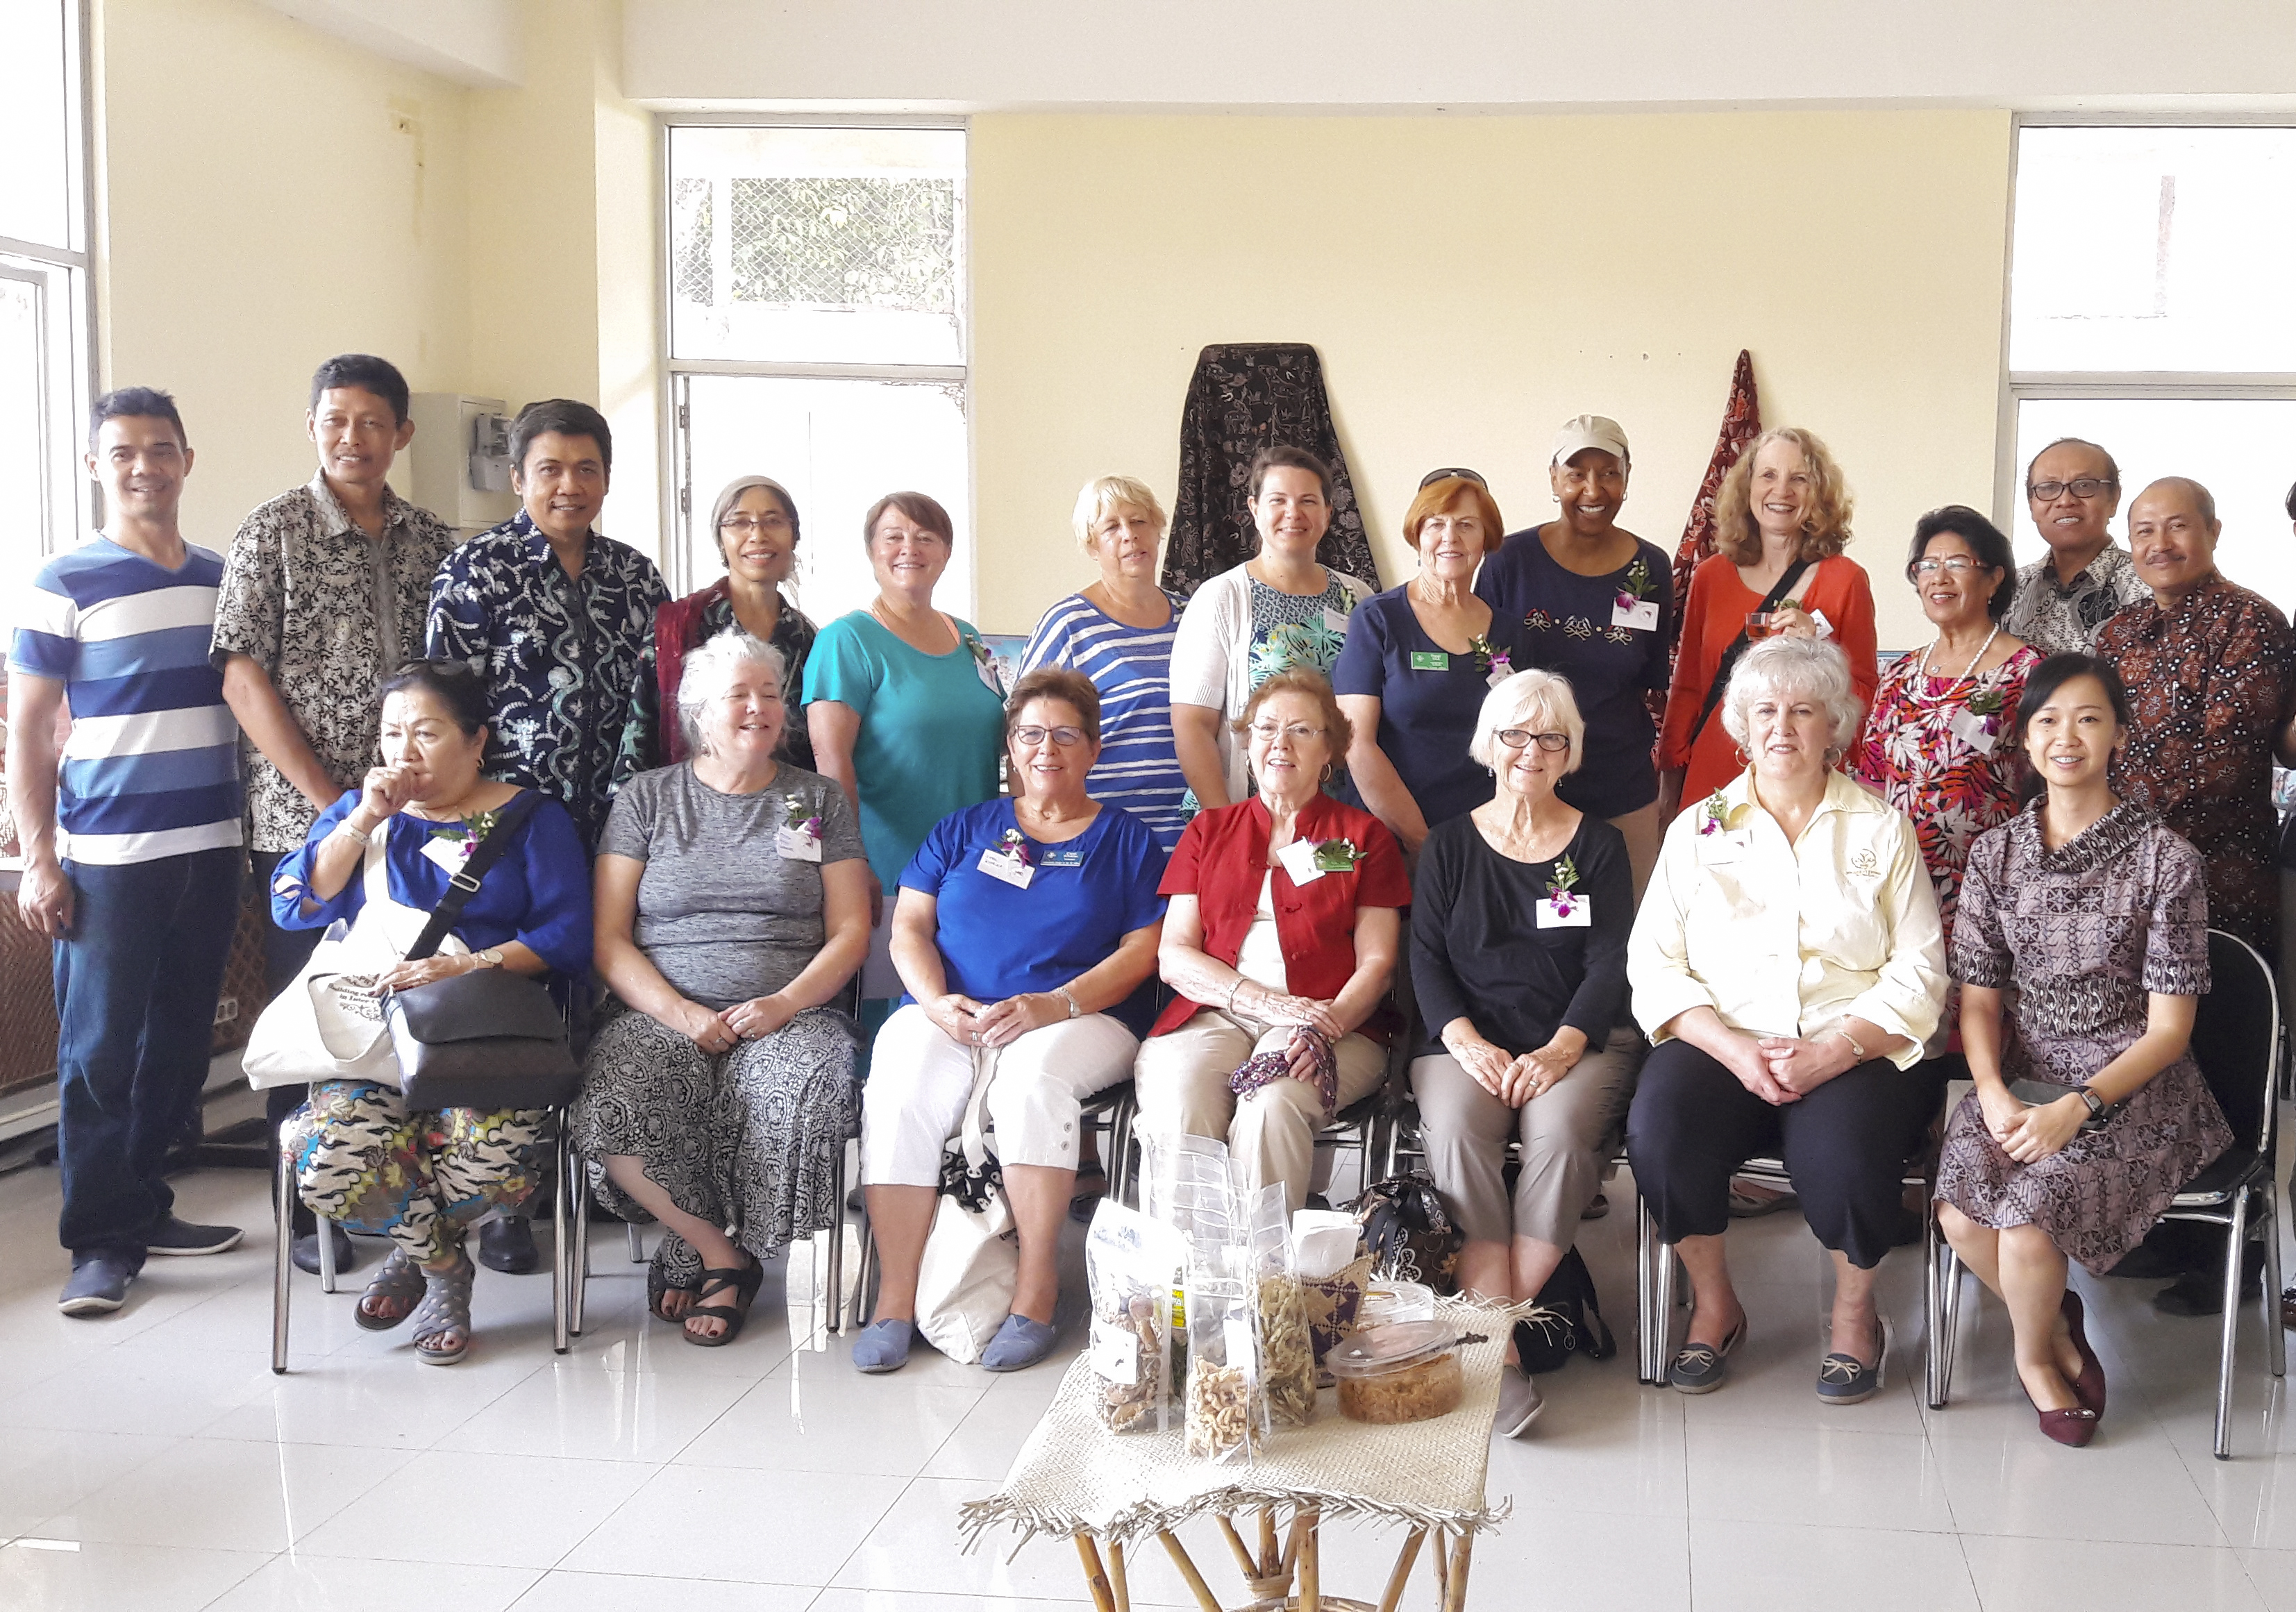 Sukahadi among the Duta Wacana lecturers and Presbyterian Women delegation.